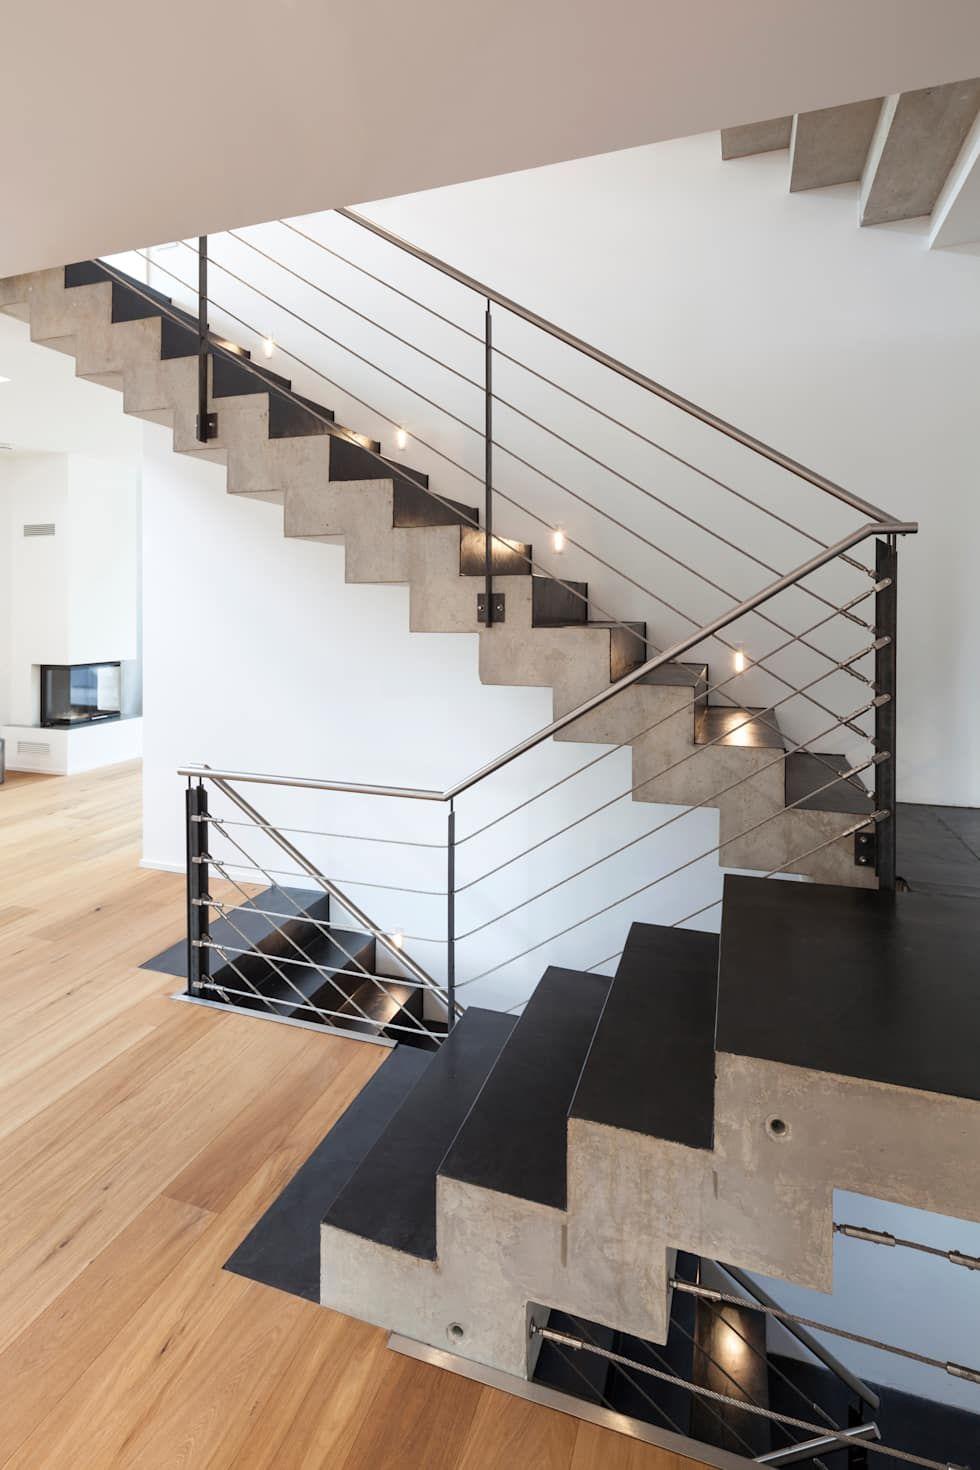 beton cir auf treppe moderner flur diele treppenhaus. Black Bedroom Furniture Sets. Home Design Ideas